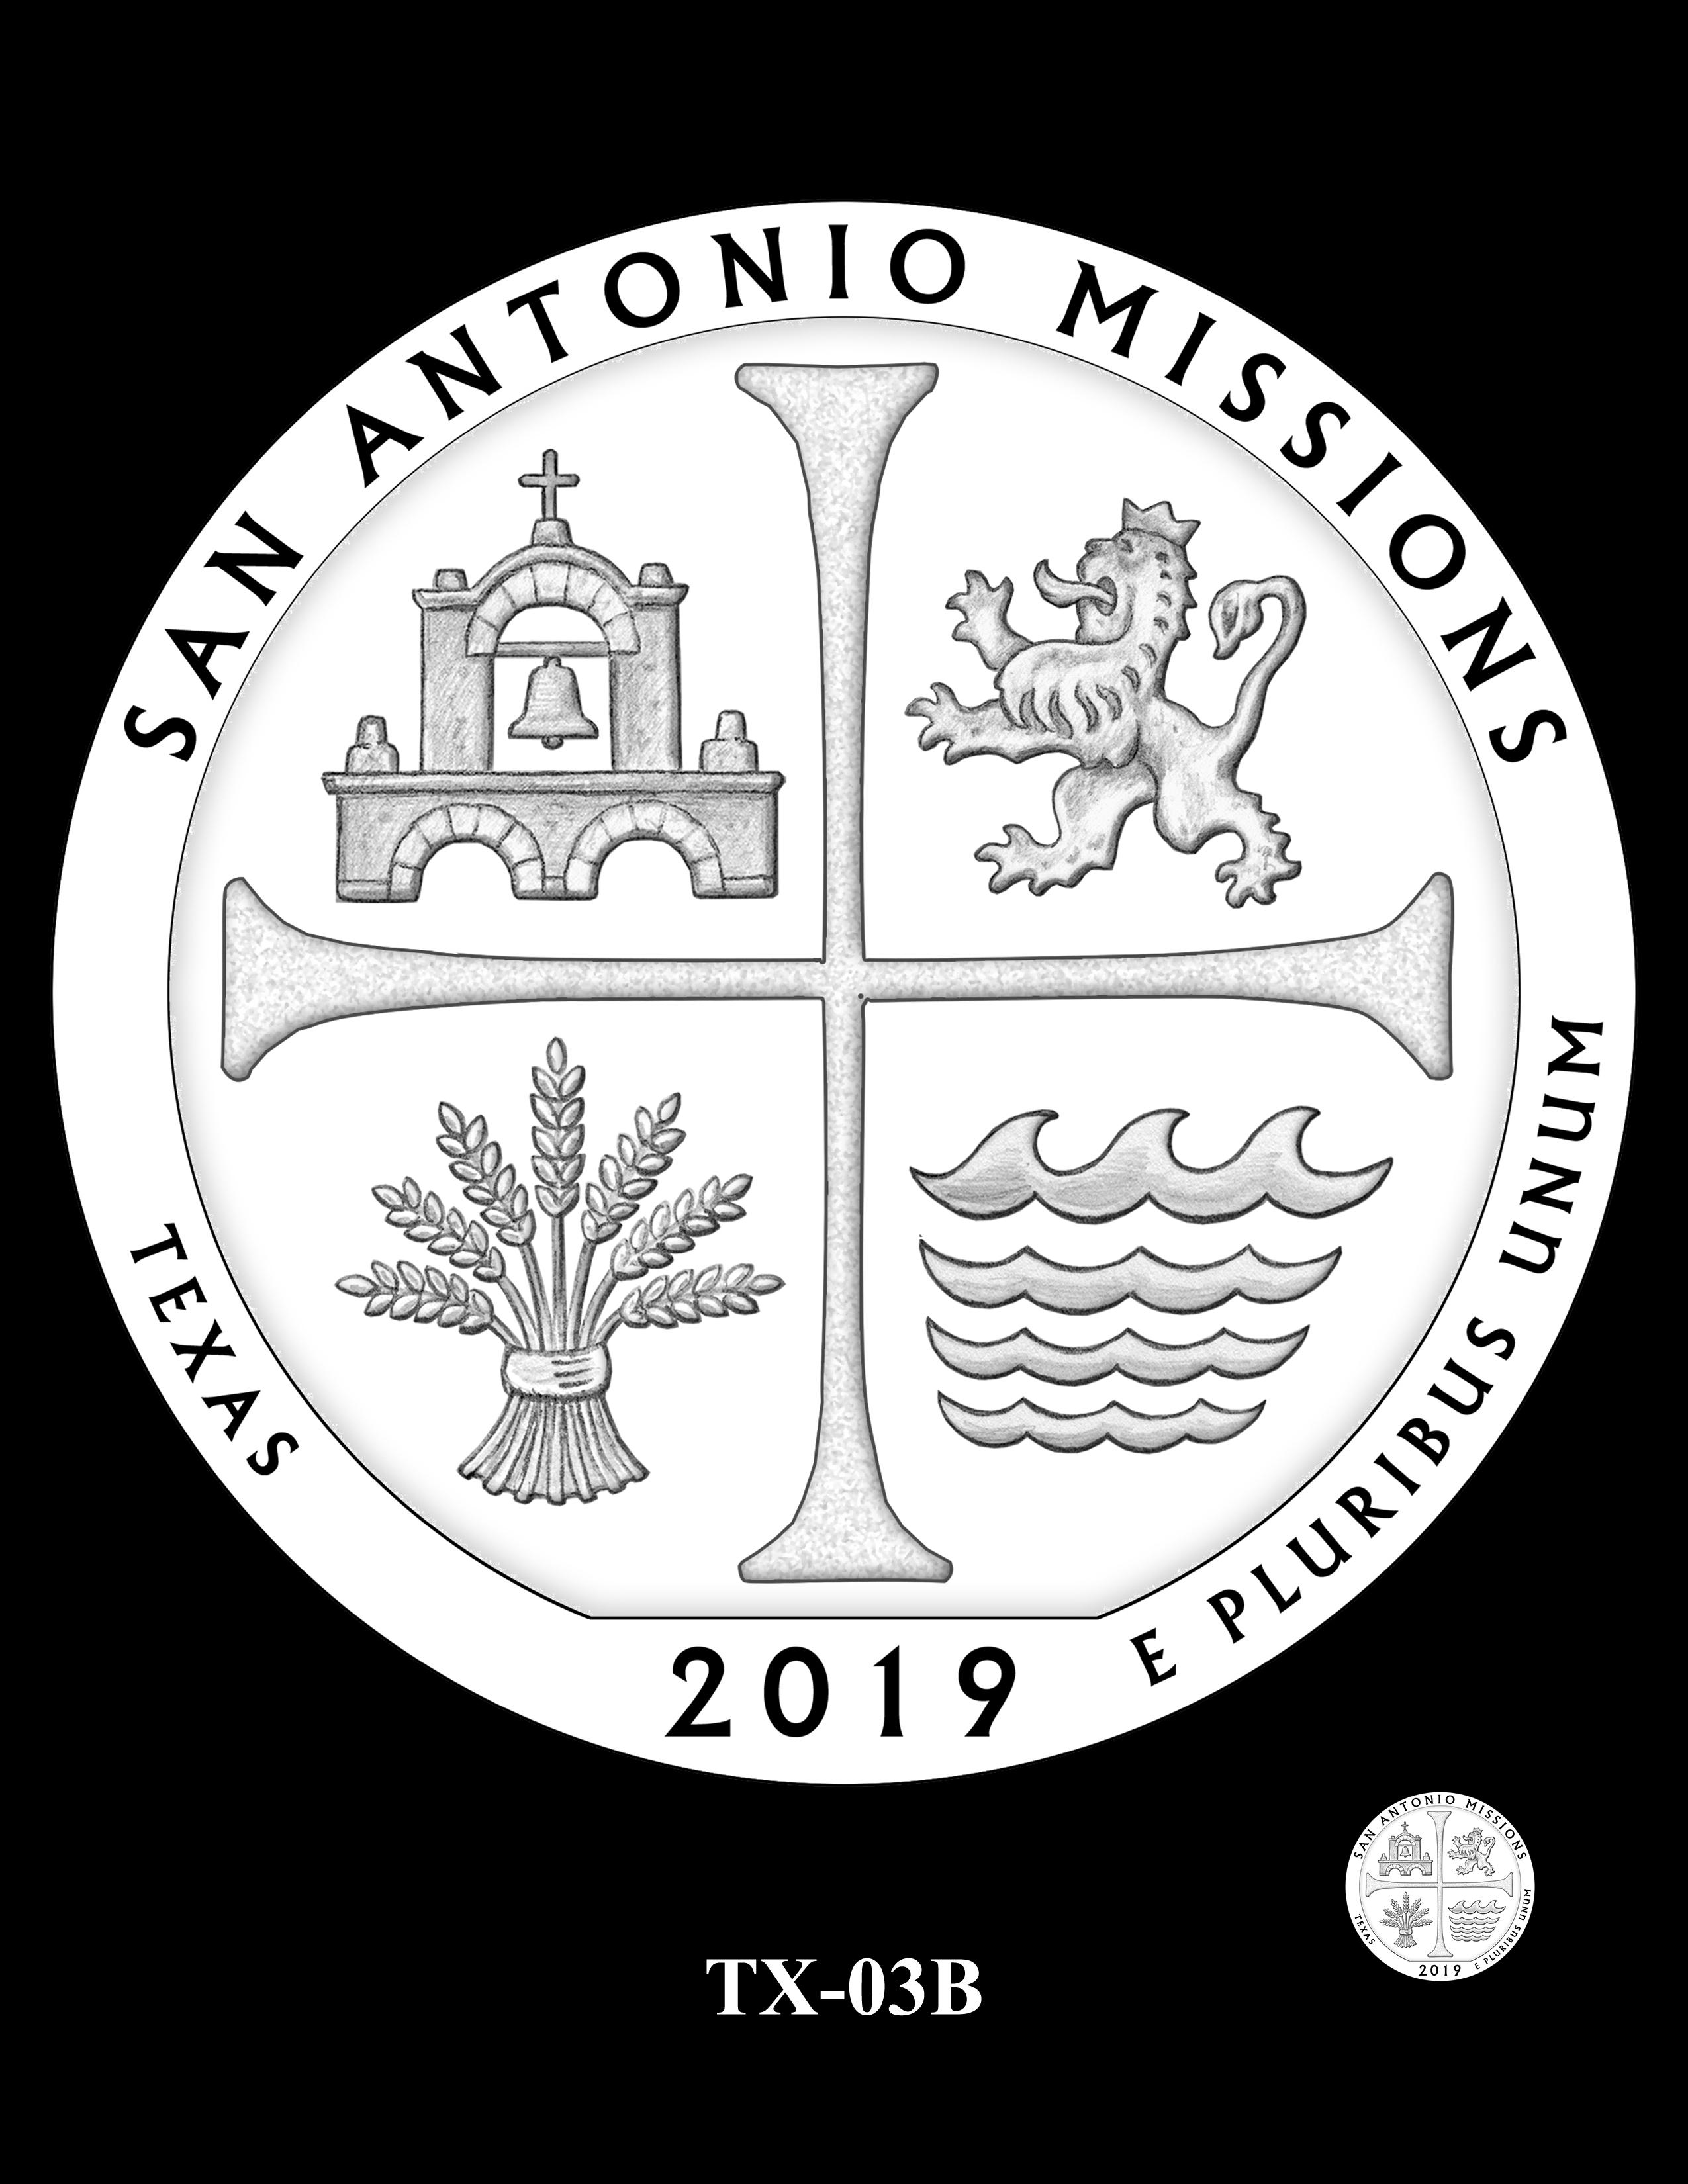 TX-03B -- 2019 America the Beautiful Quarters® Program